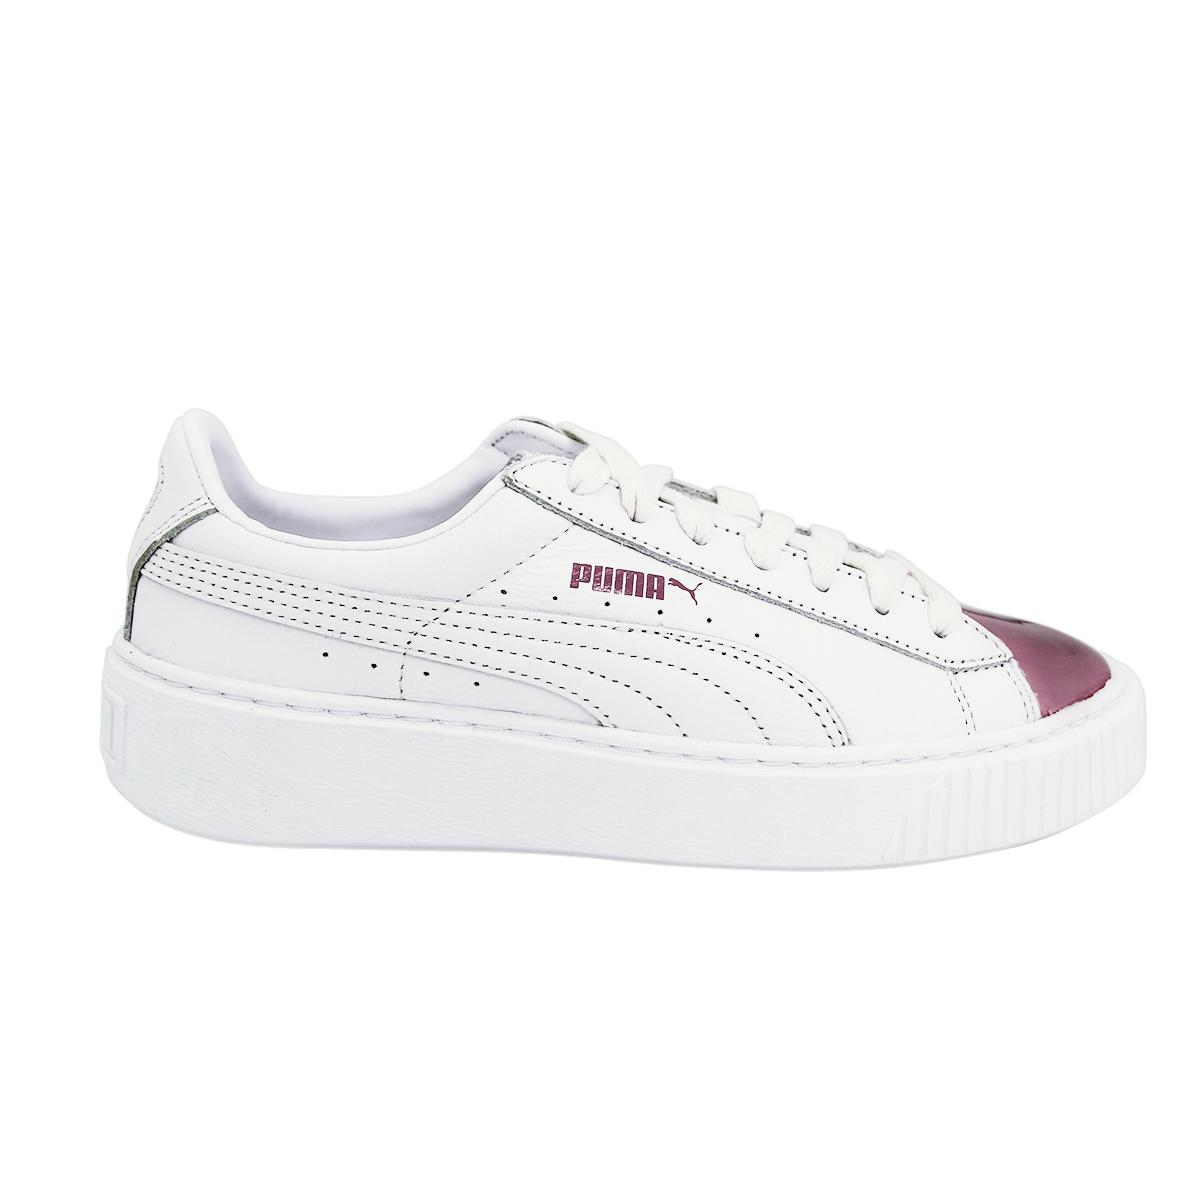 PUMA Basket Platform Metallic Damen Sneaker 38.5 EU